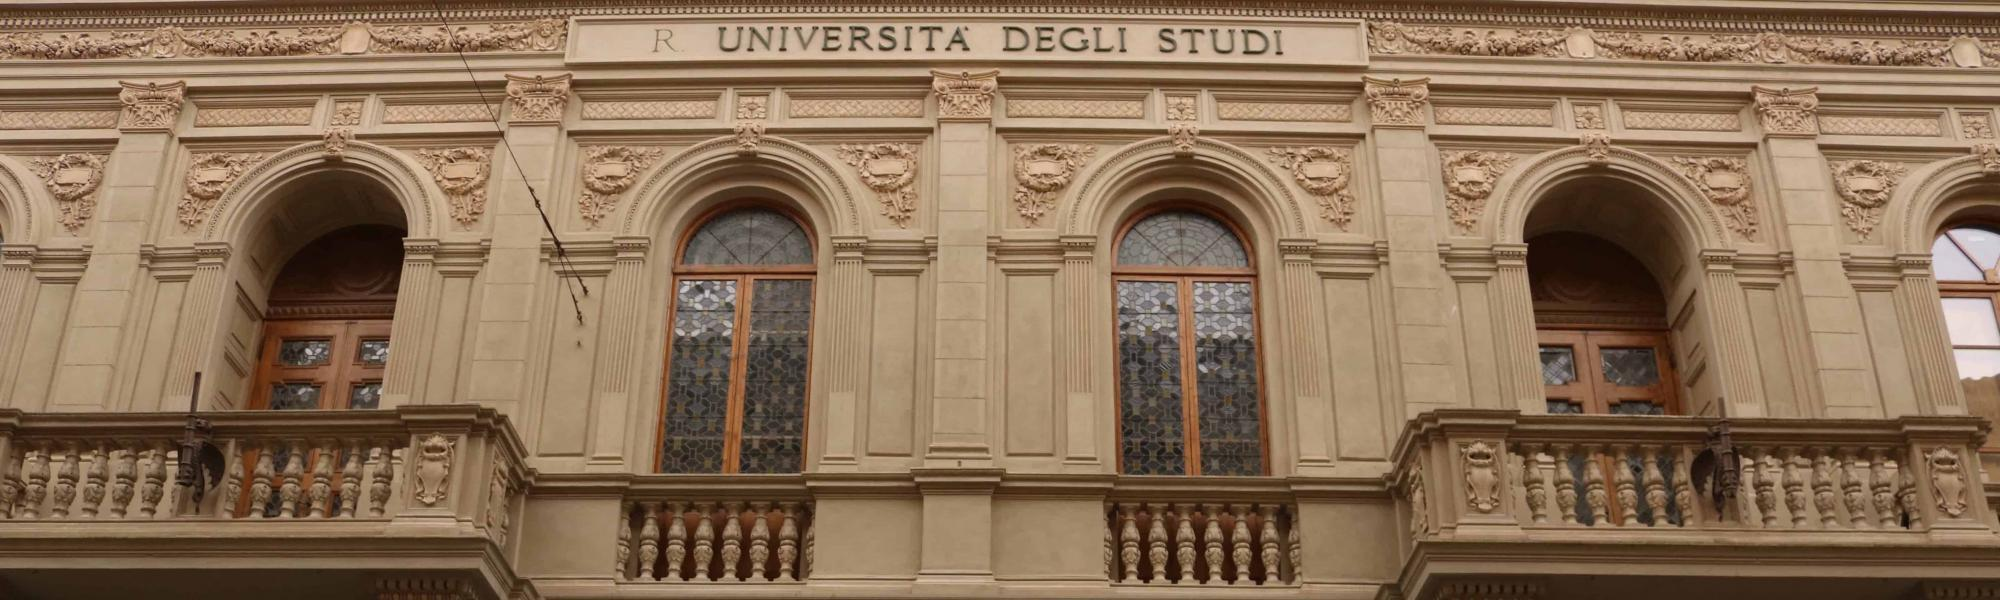 Particolari facciata esterna - La Sapienza (A. Matteucci)